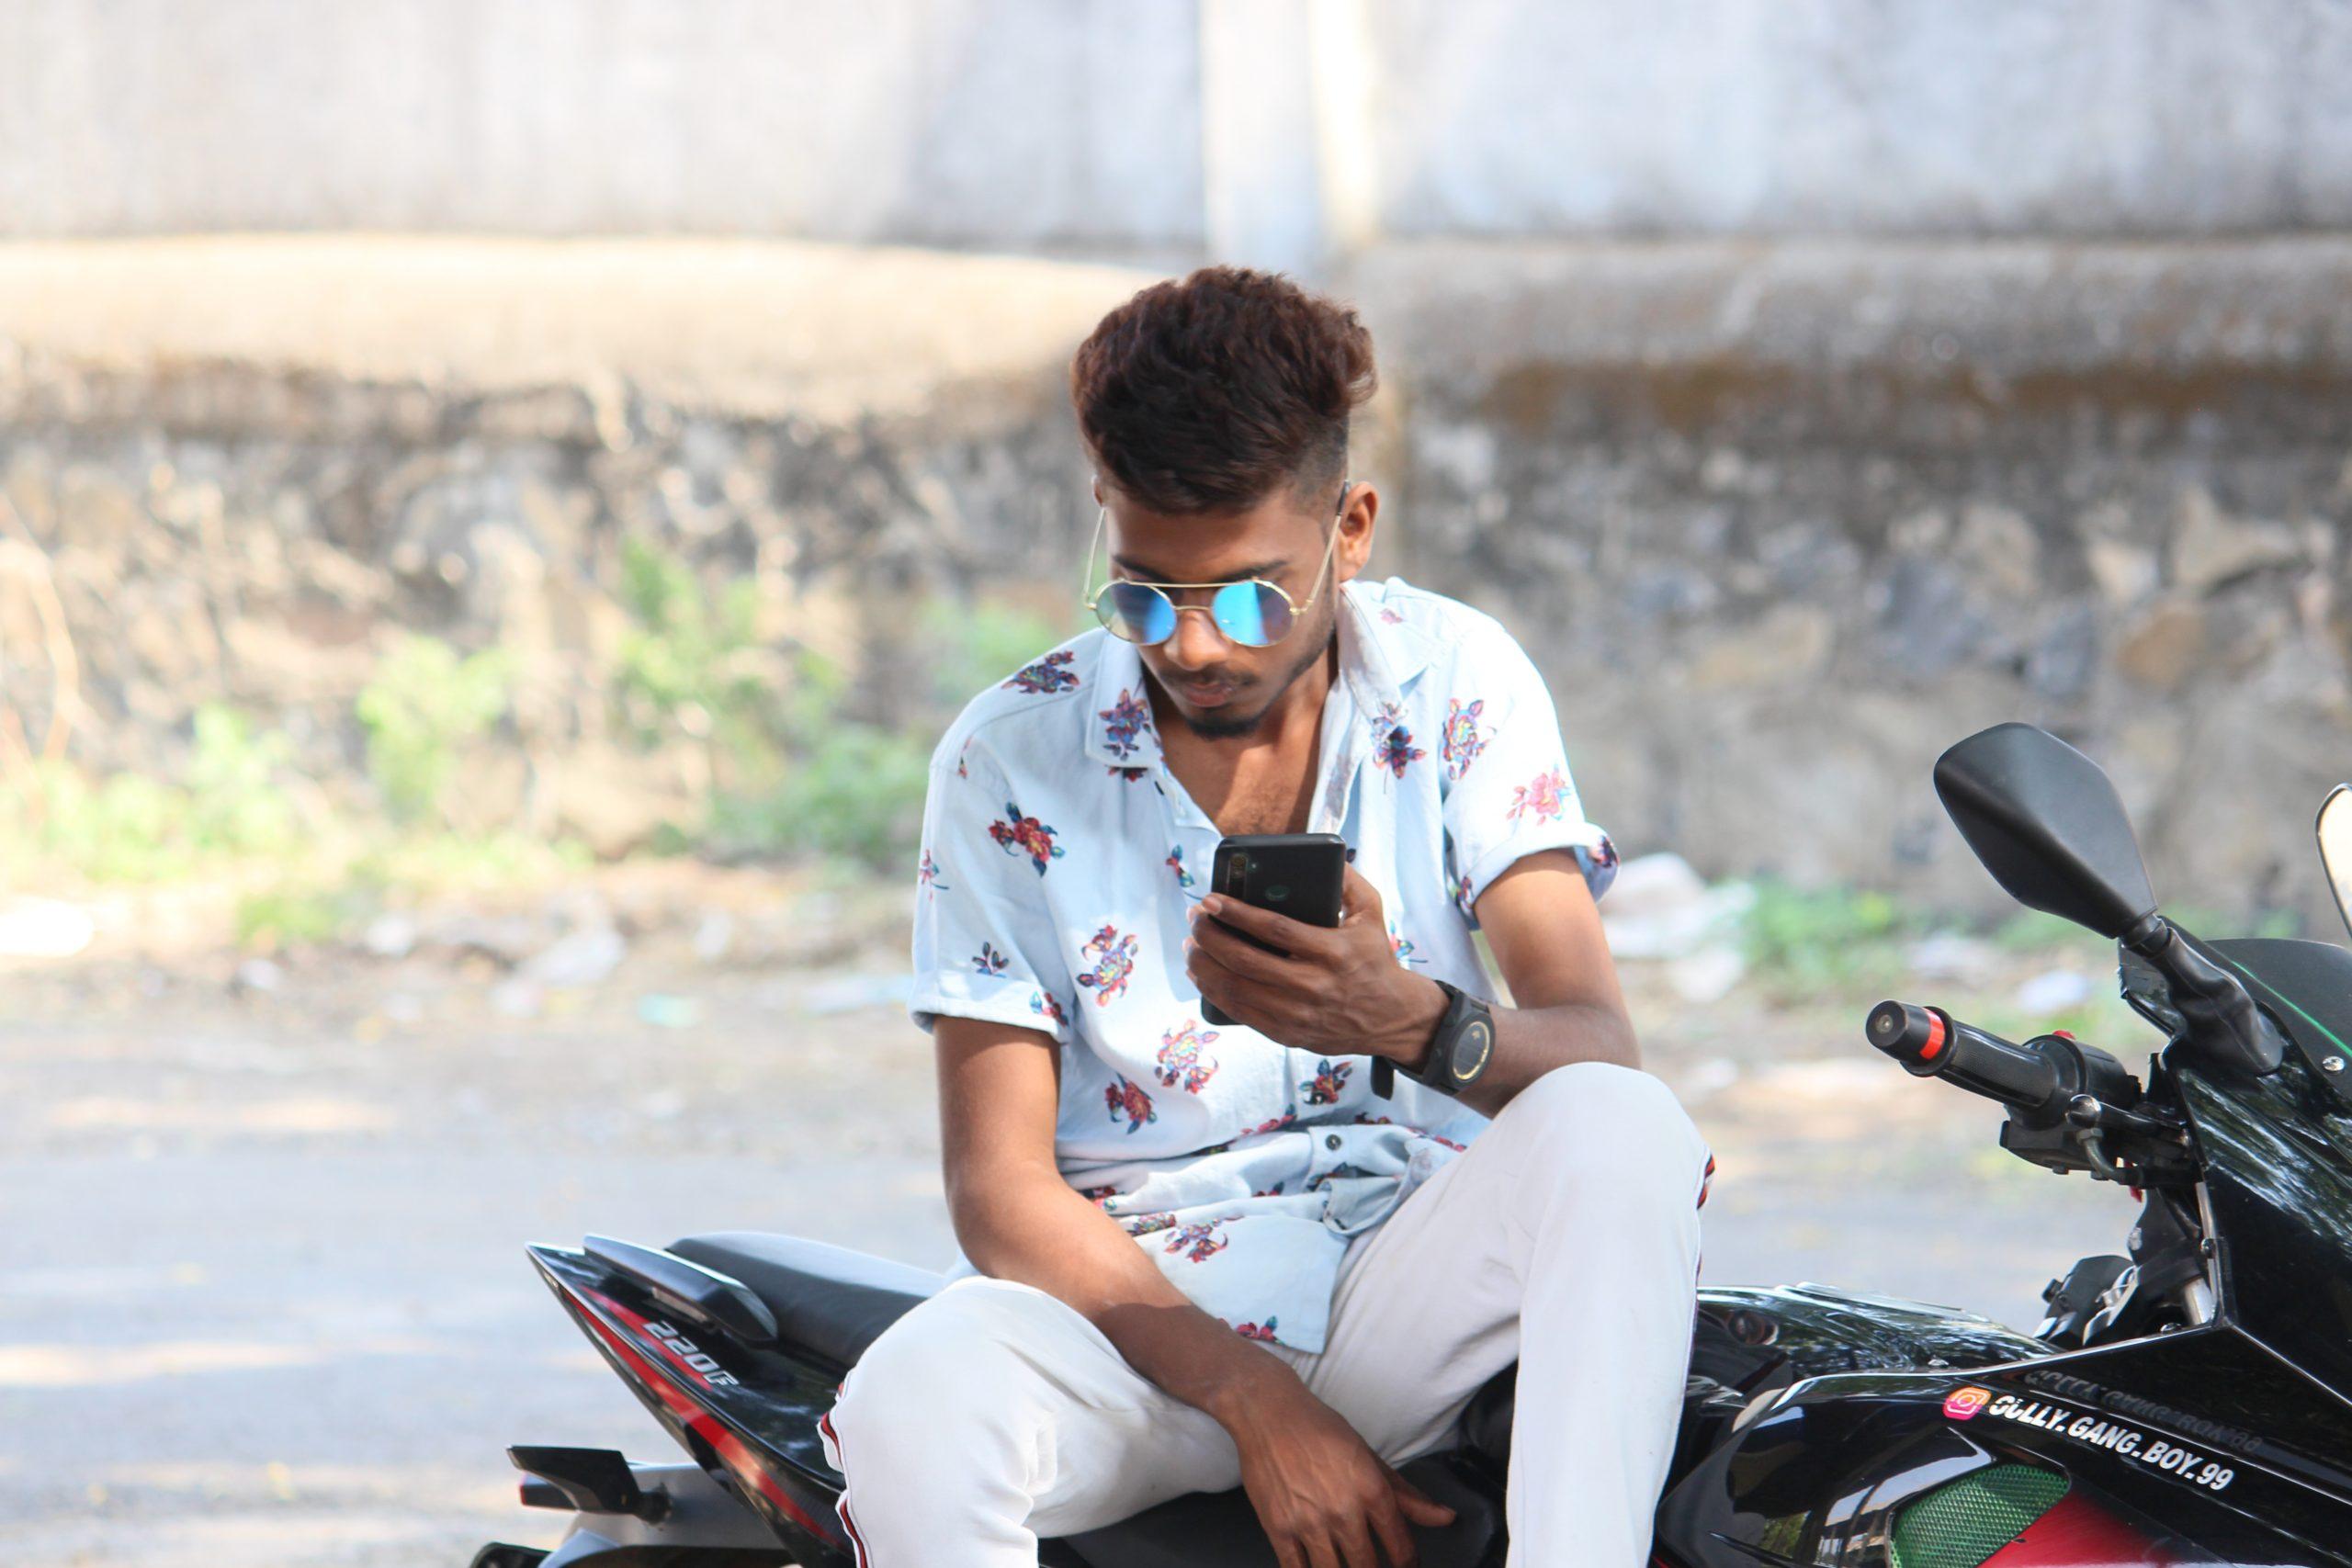 Boy posing while sitting on the Bike